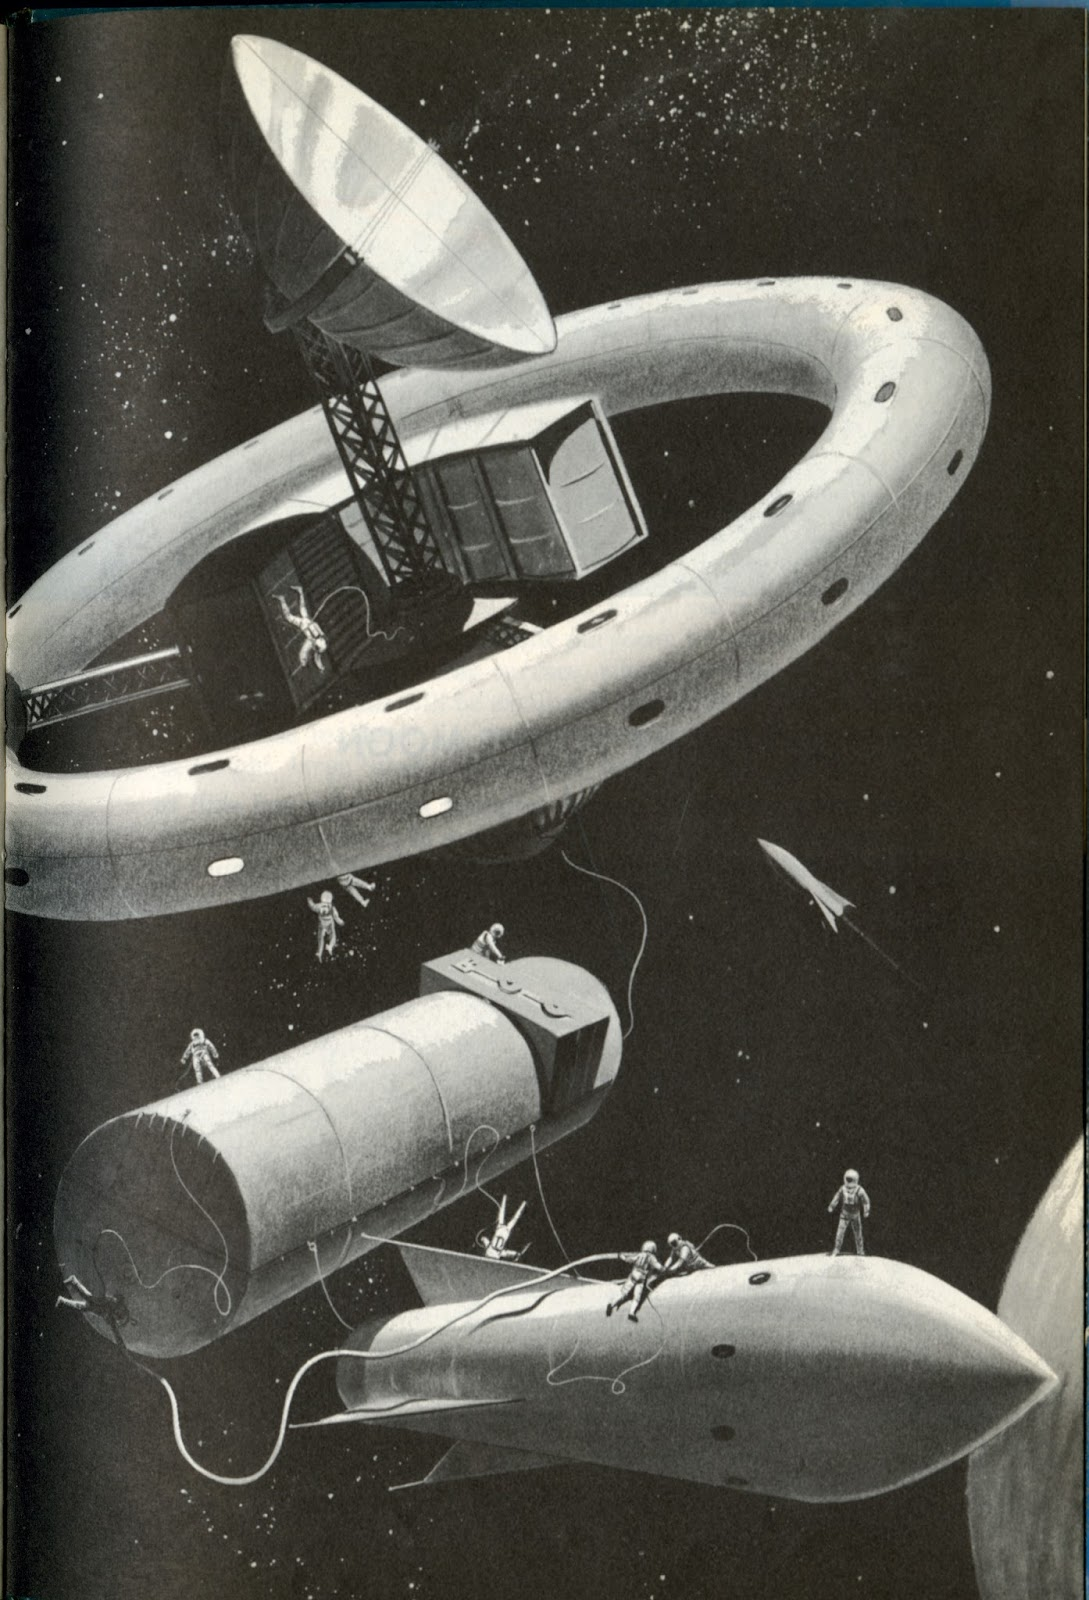 1958 space exploration - photo #5